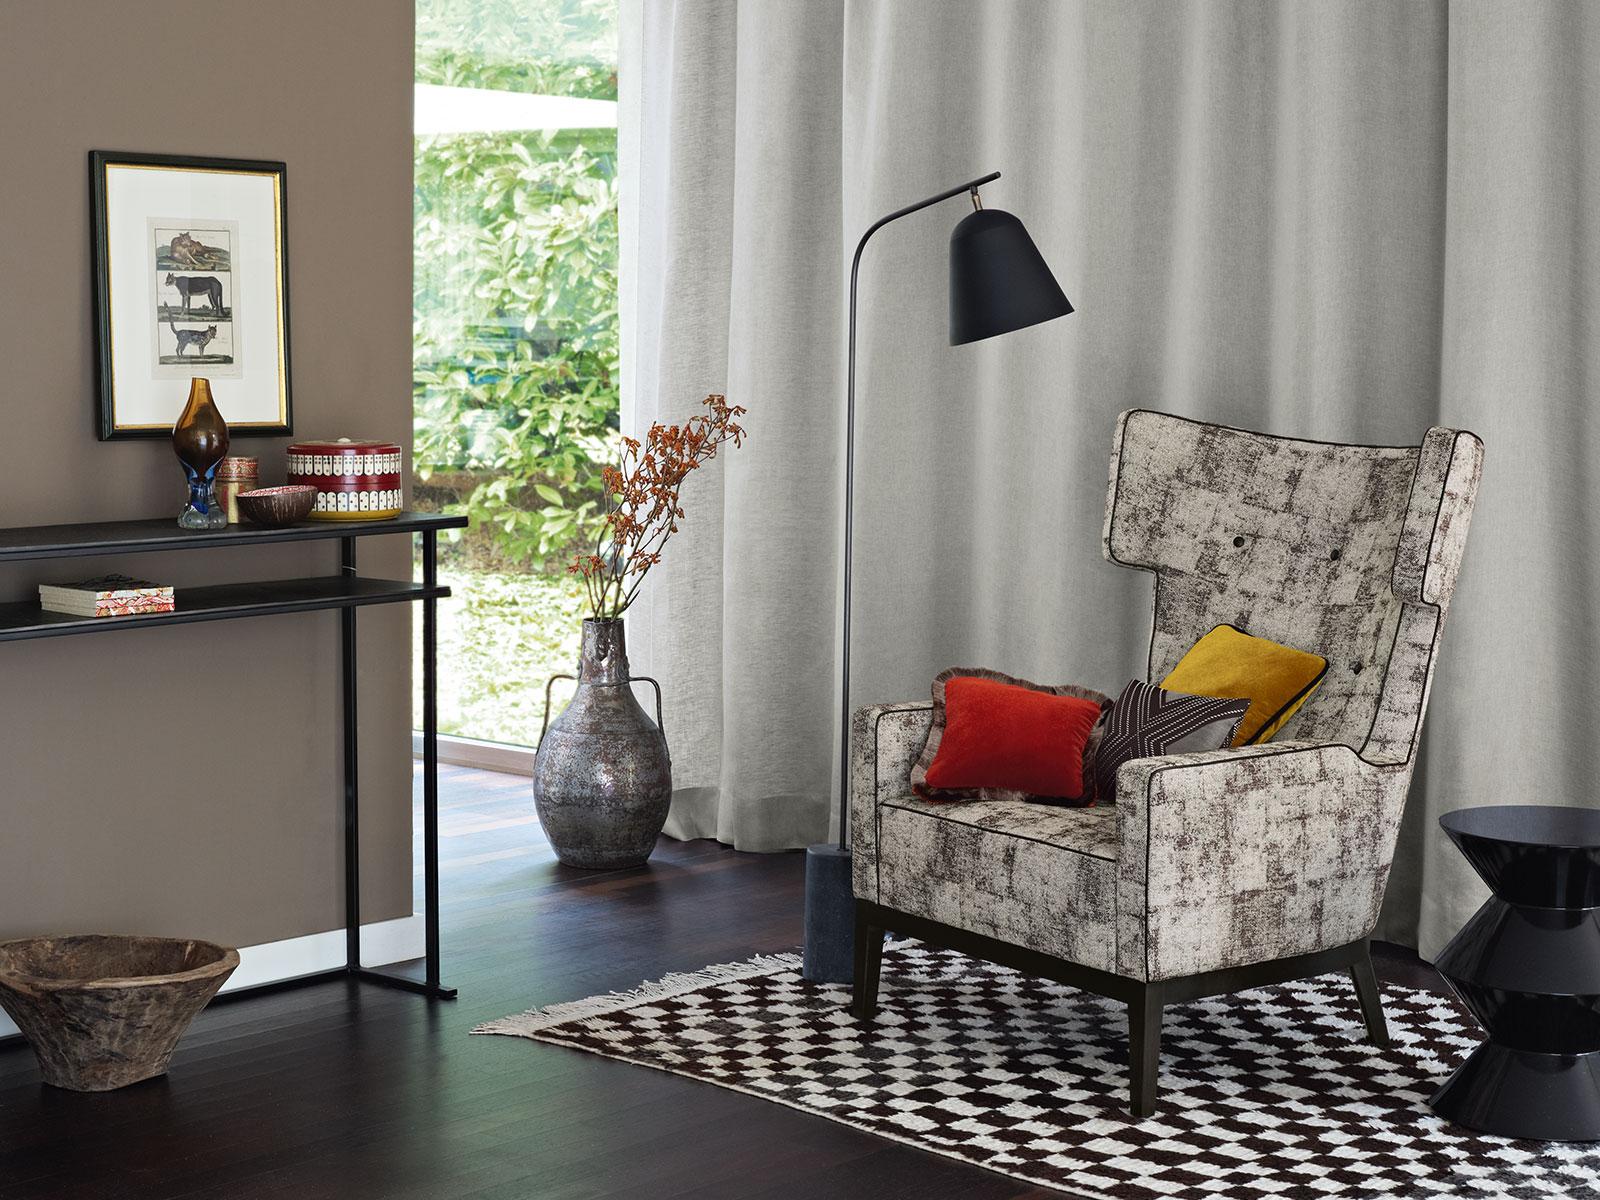 zimmer rhode designer fabric stockist london fabric. Black Bedroom Furniture Sets. Home Design Ideas